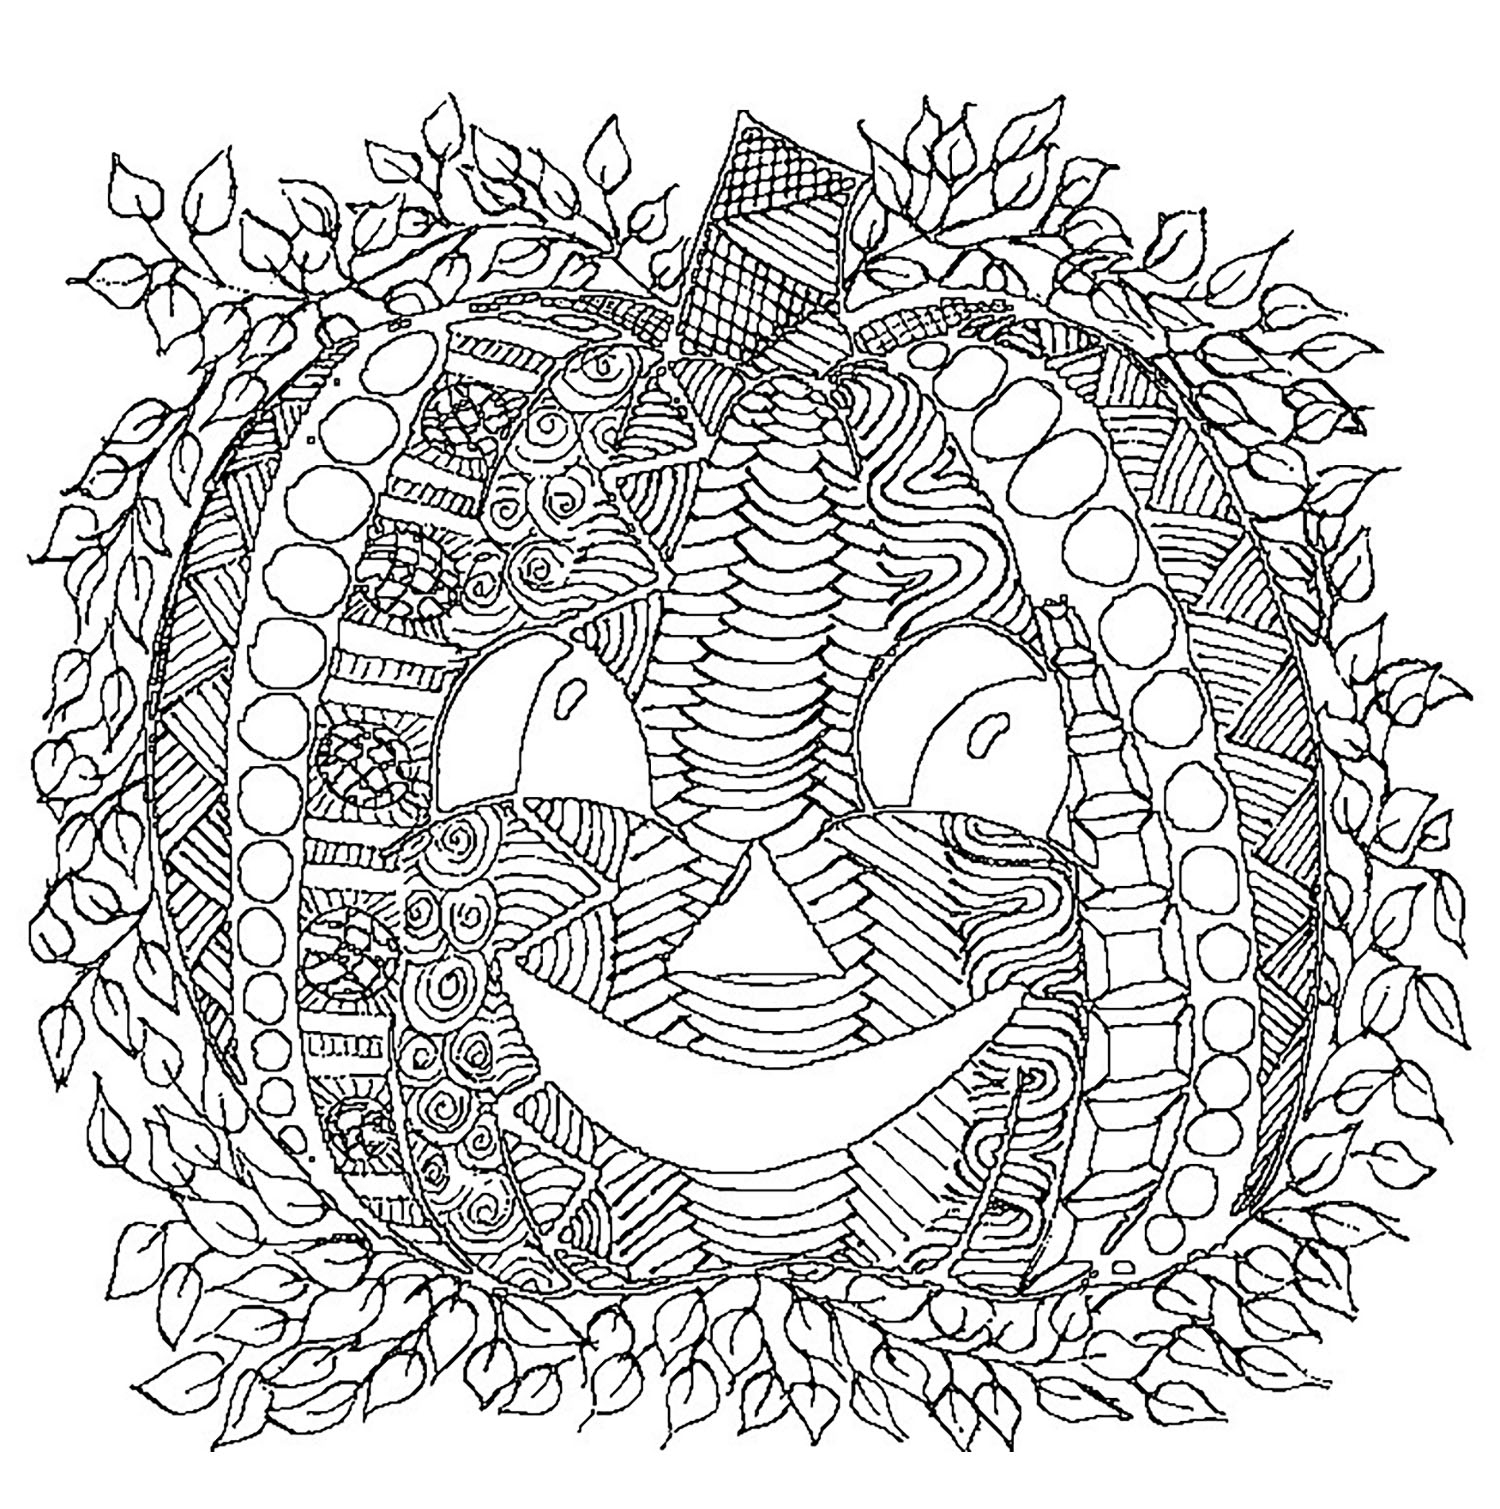 Halloween Citrouille Dessin - Halloween - Coloriages à Dessin Halloween Citrouille A Imprimer Gratuit